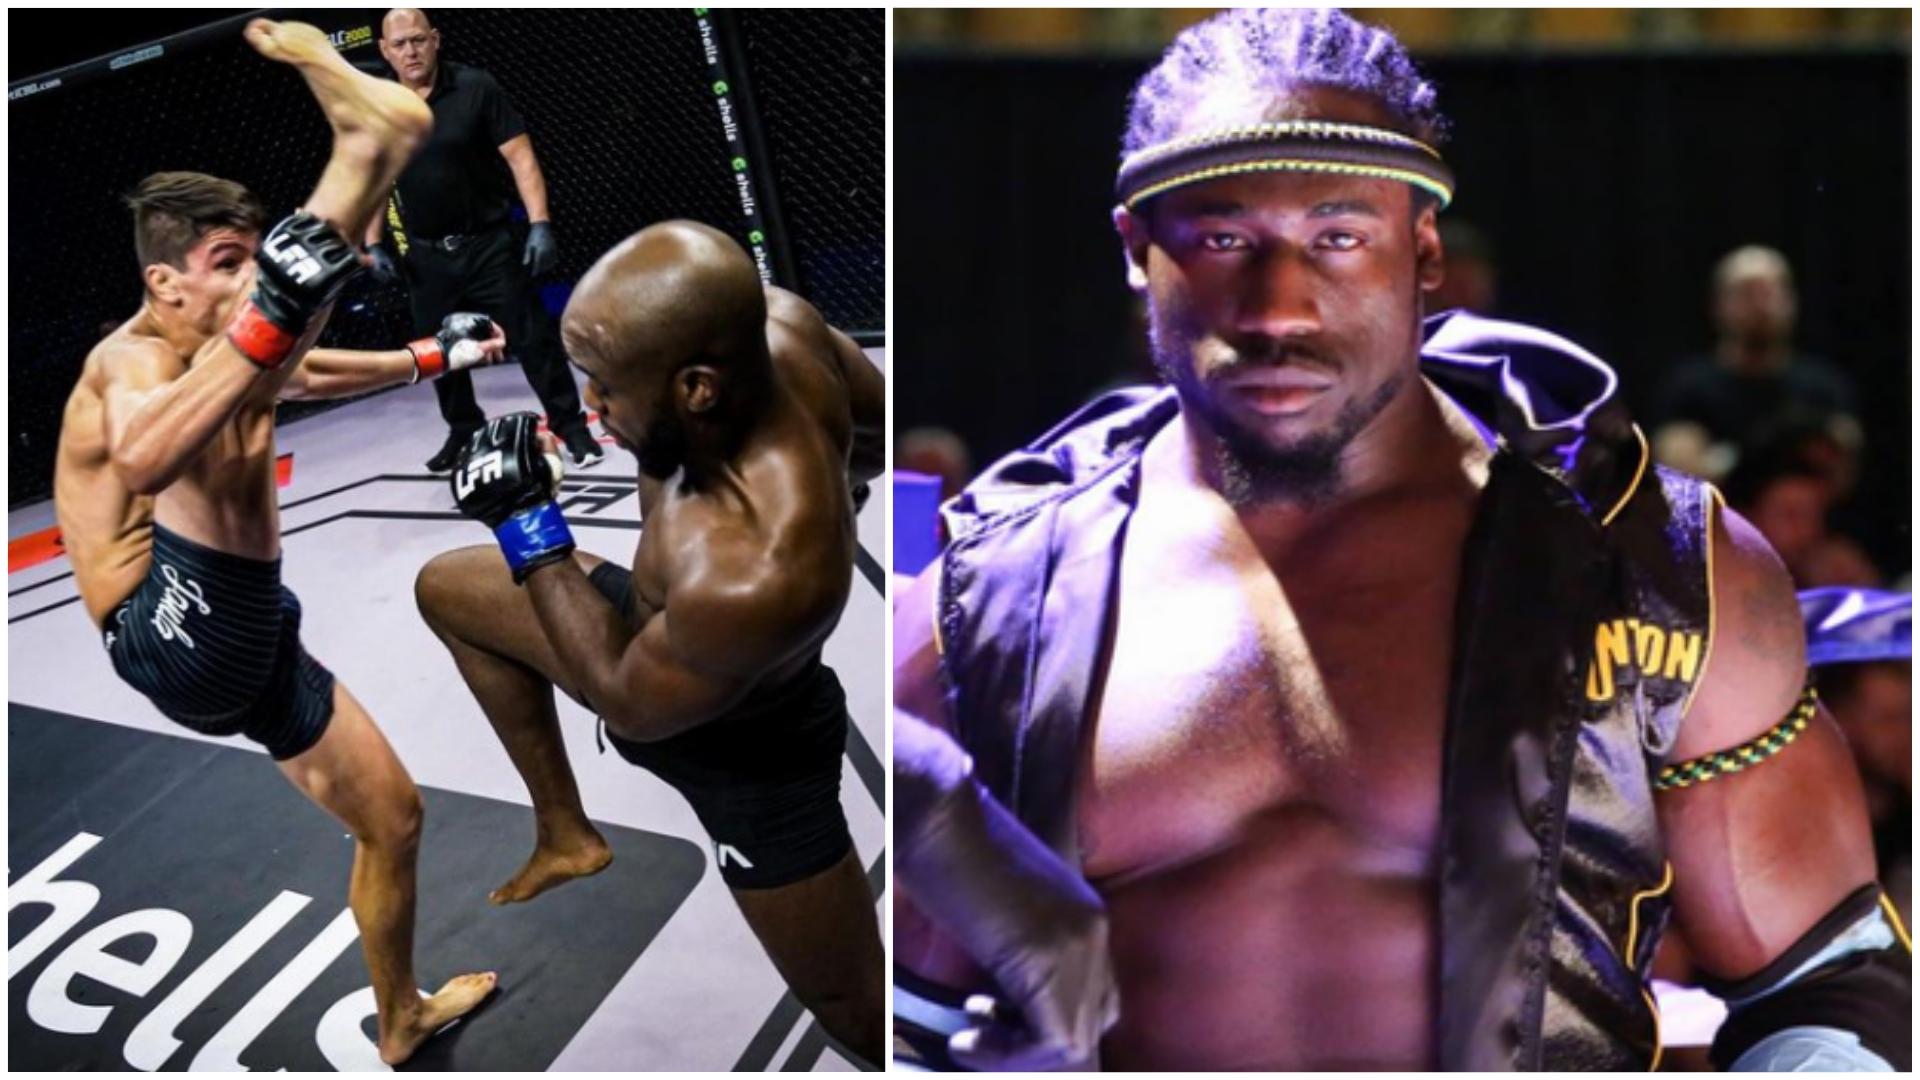 Frontkick Online UFC MMA Doldisar Ignacio Bahamondes William Knight